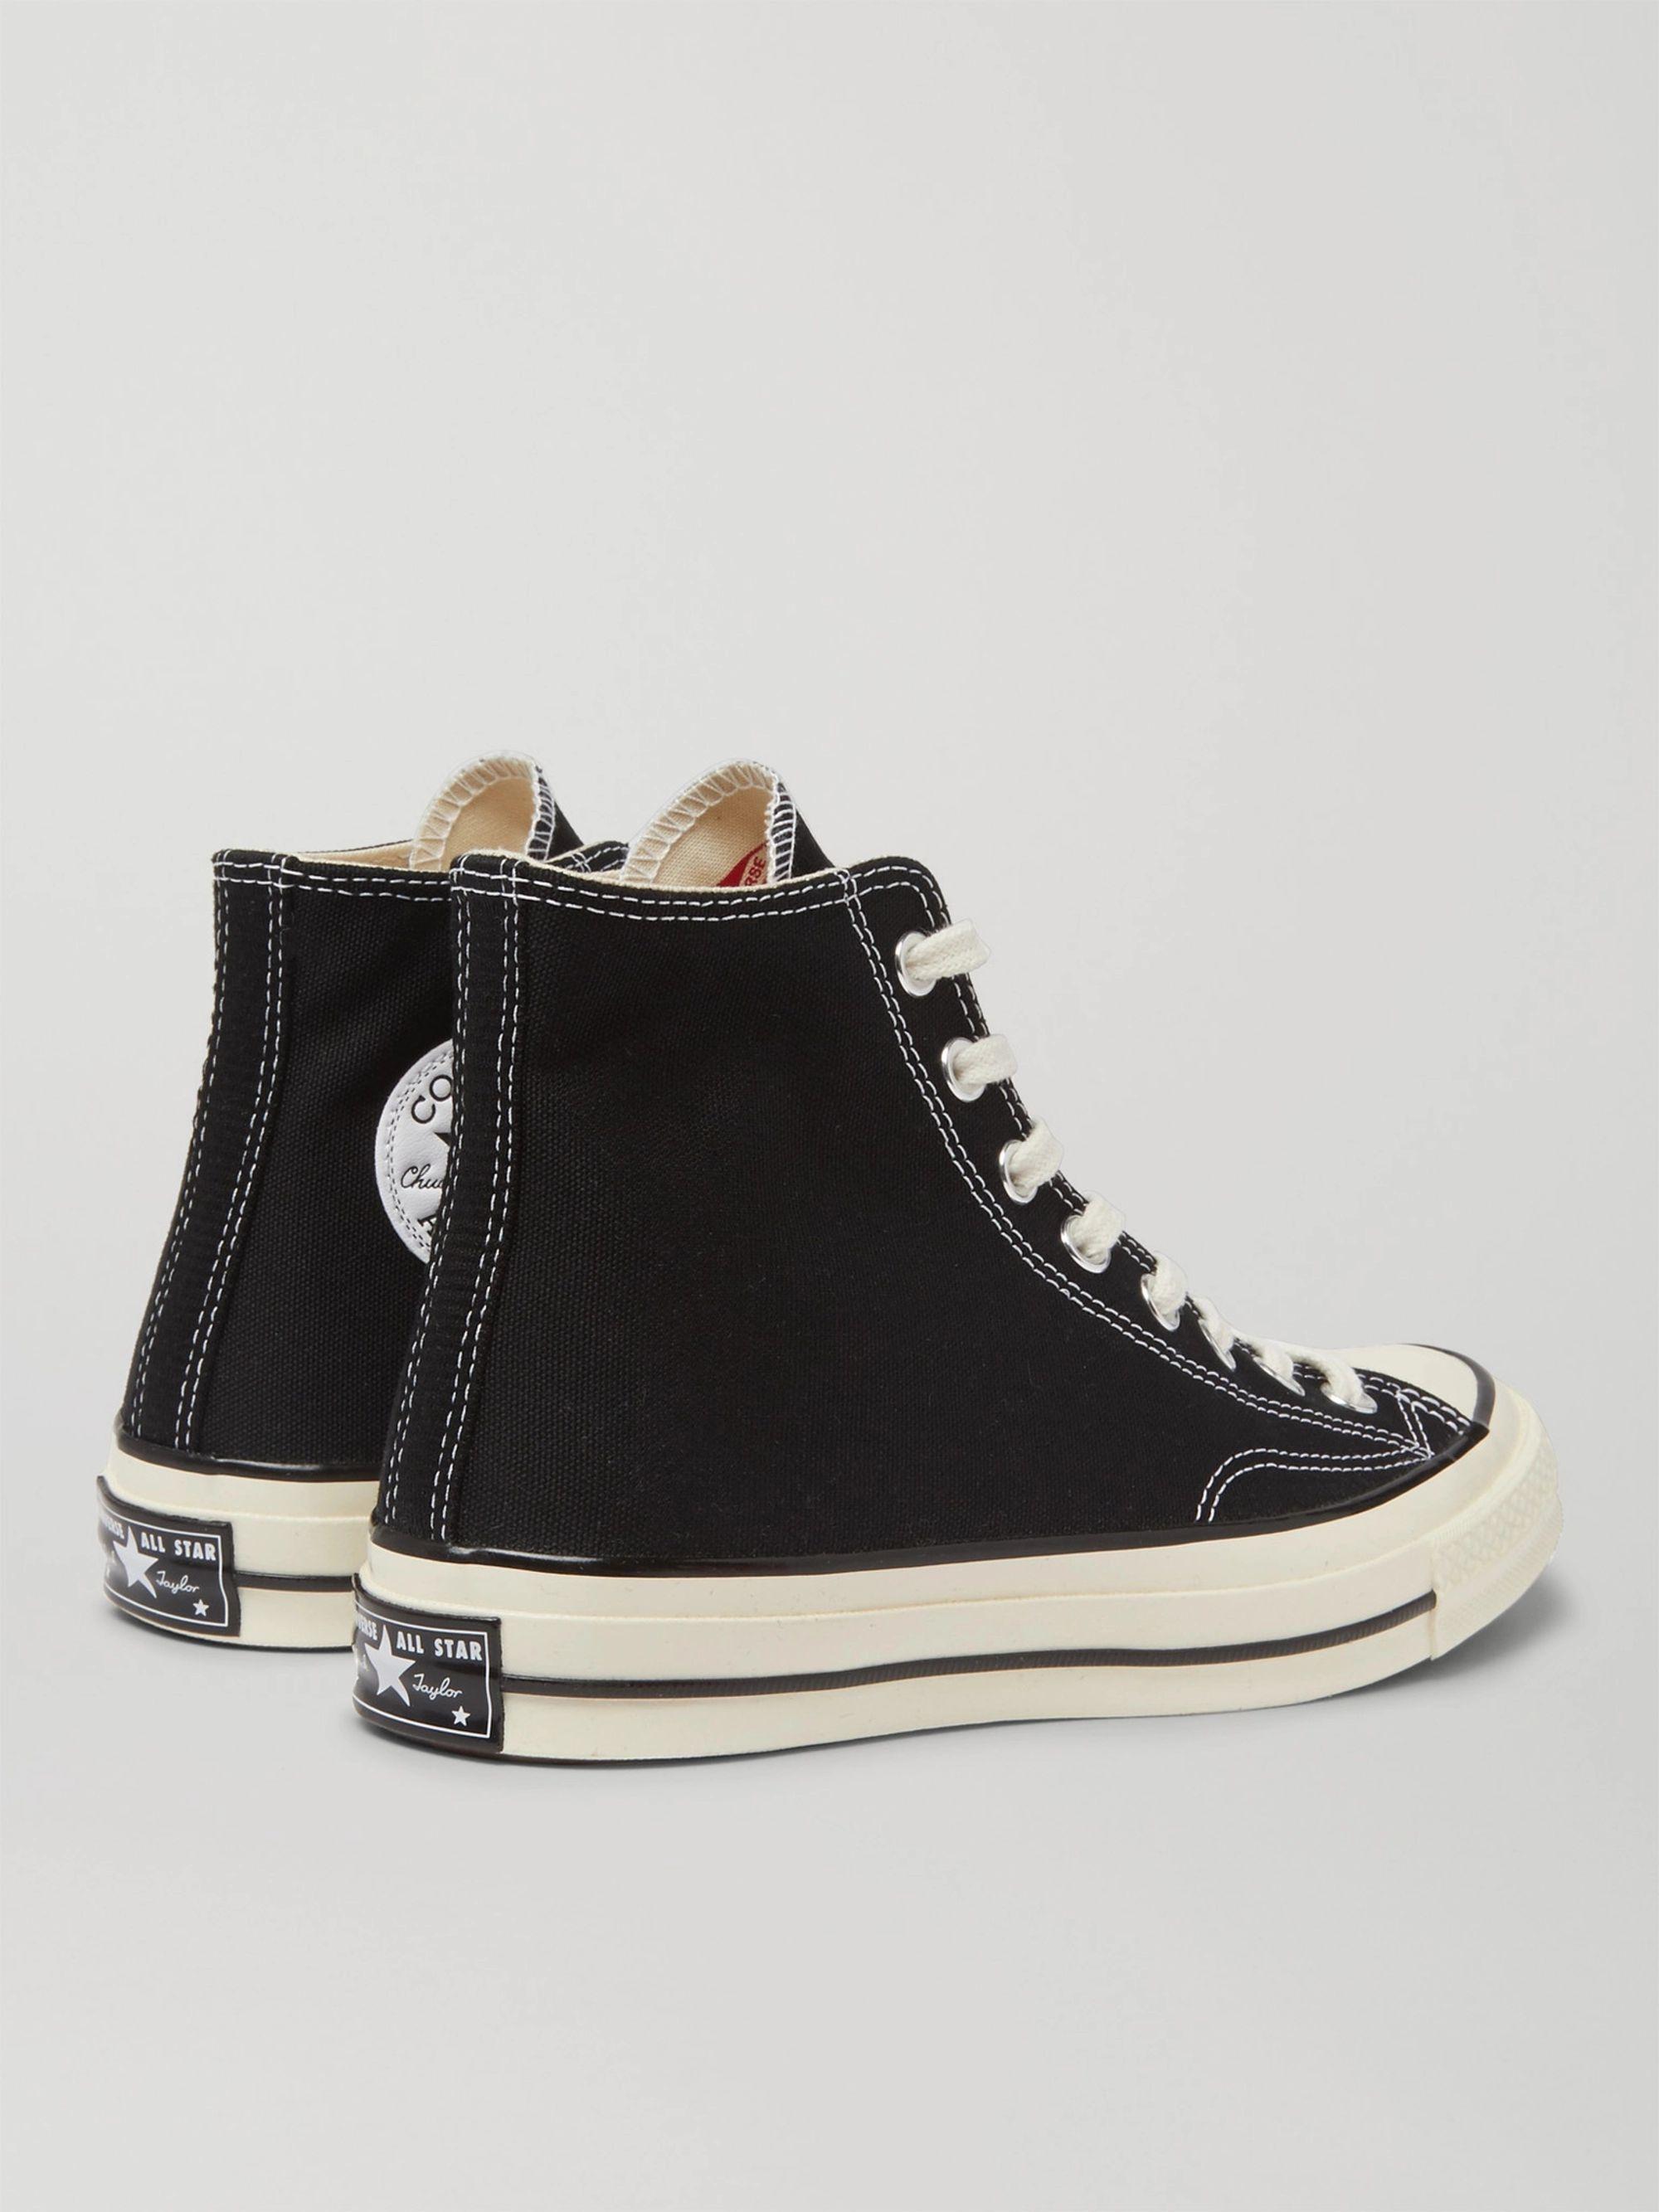 Black Chuck 70 Canvas High-top Sneakers   Converse